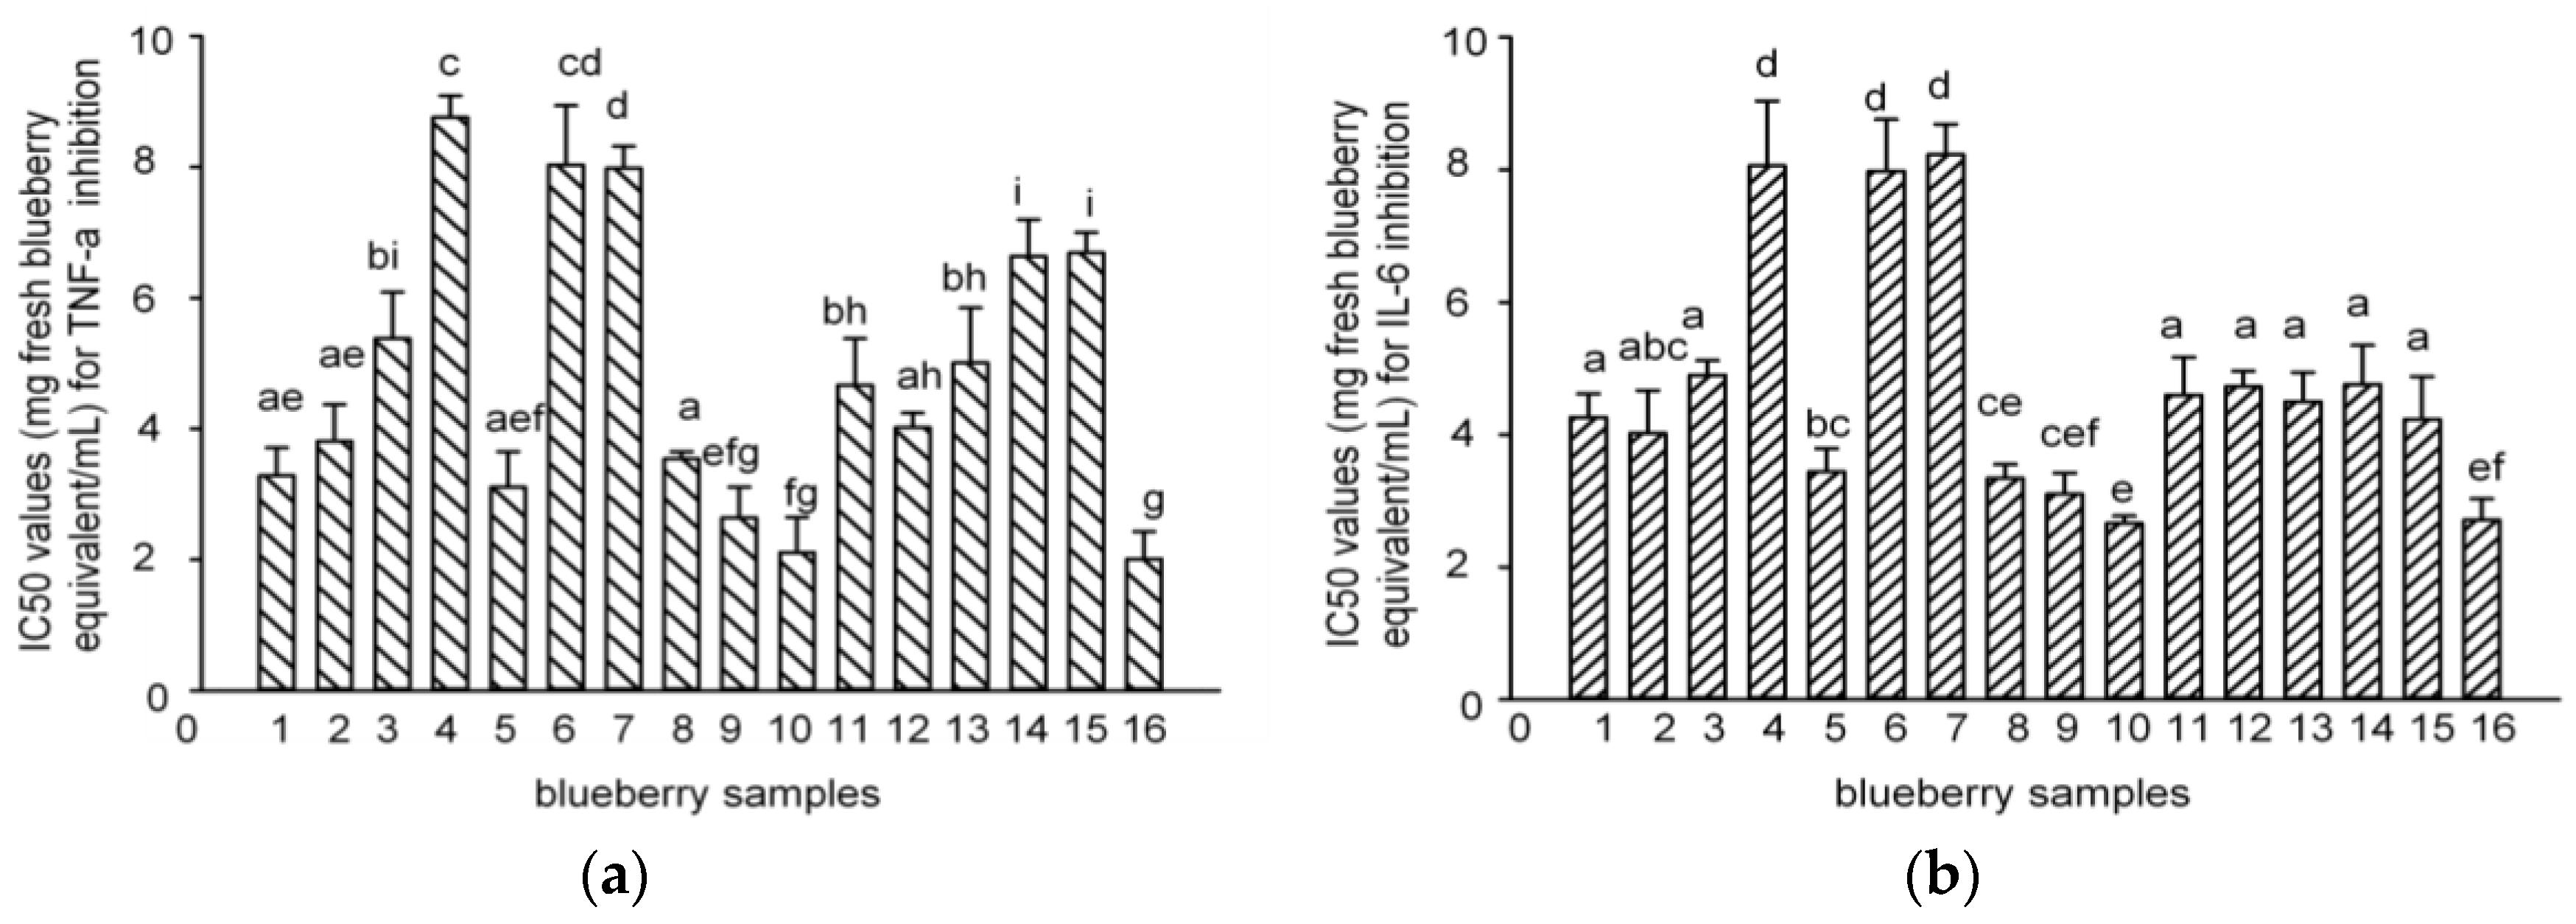 Molecules | Free Full-Text | Phenolic Acid Profiling, Antioxidant